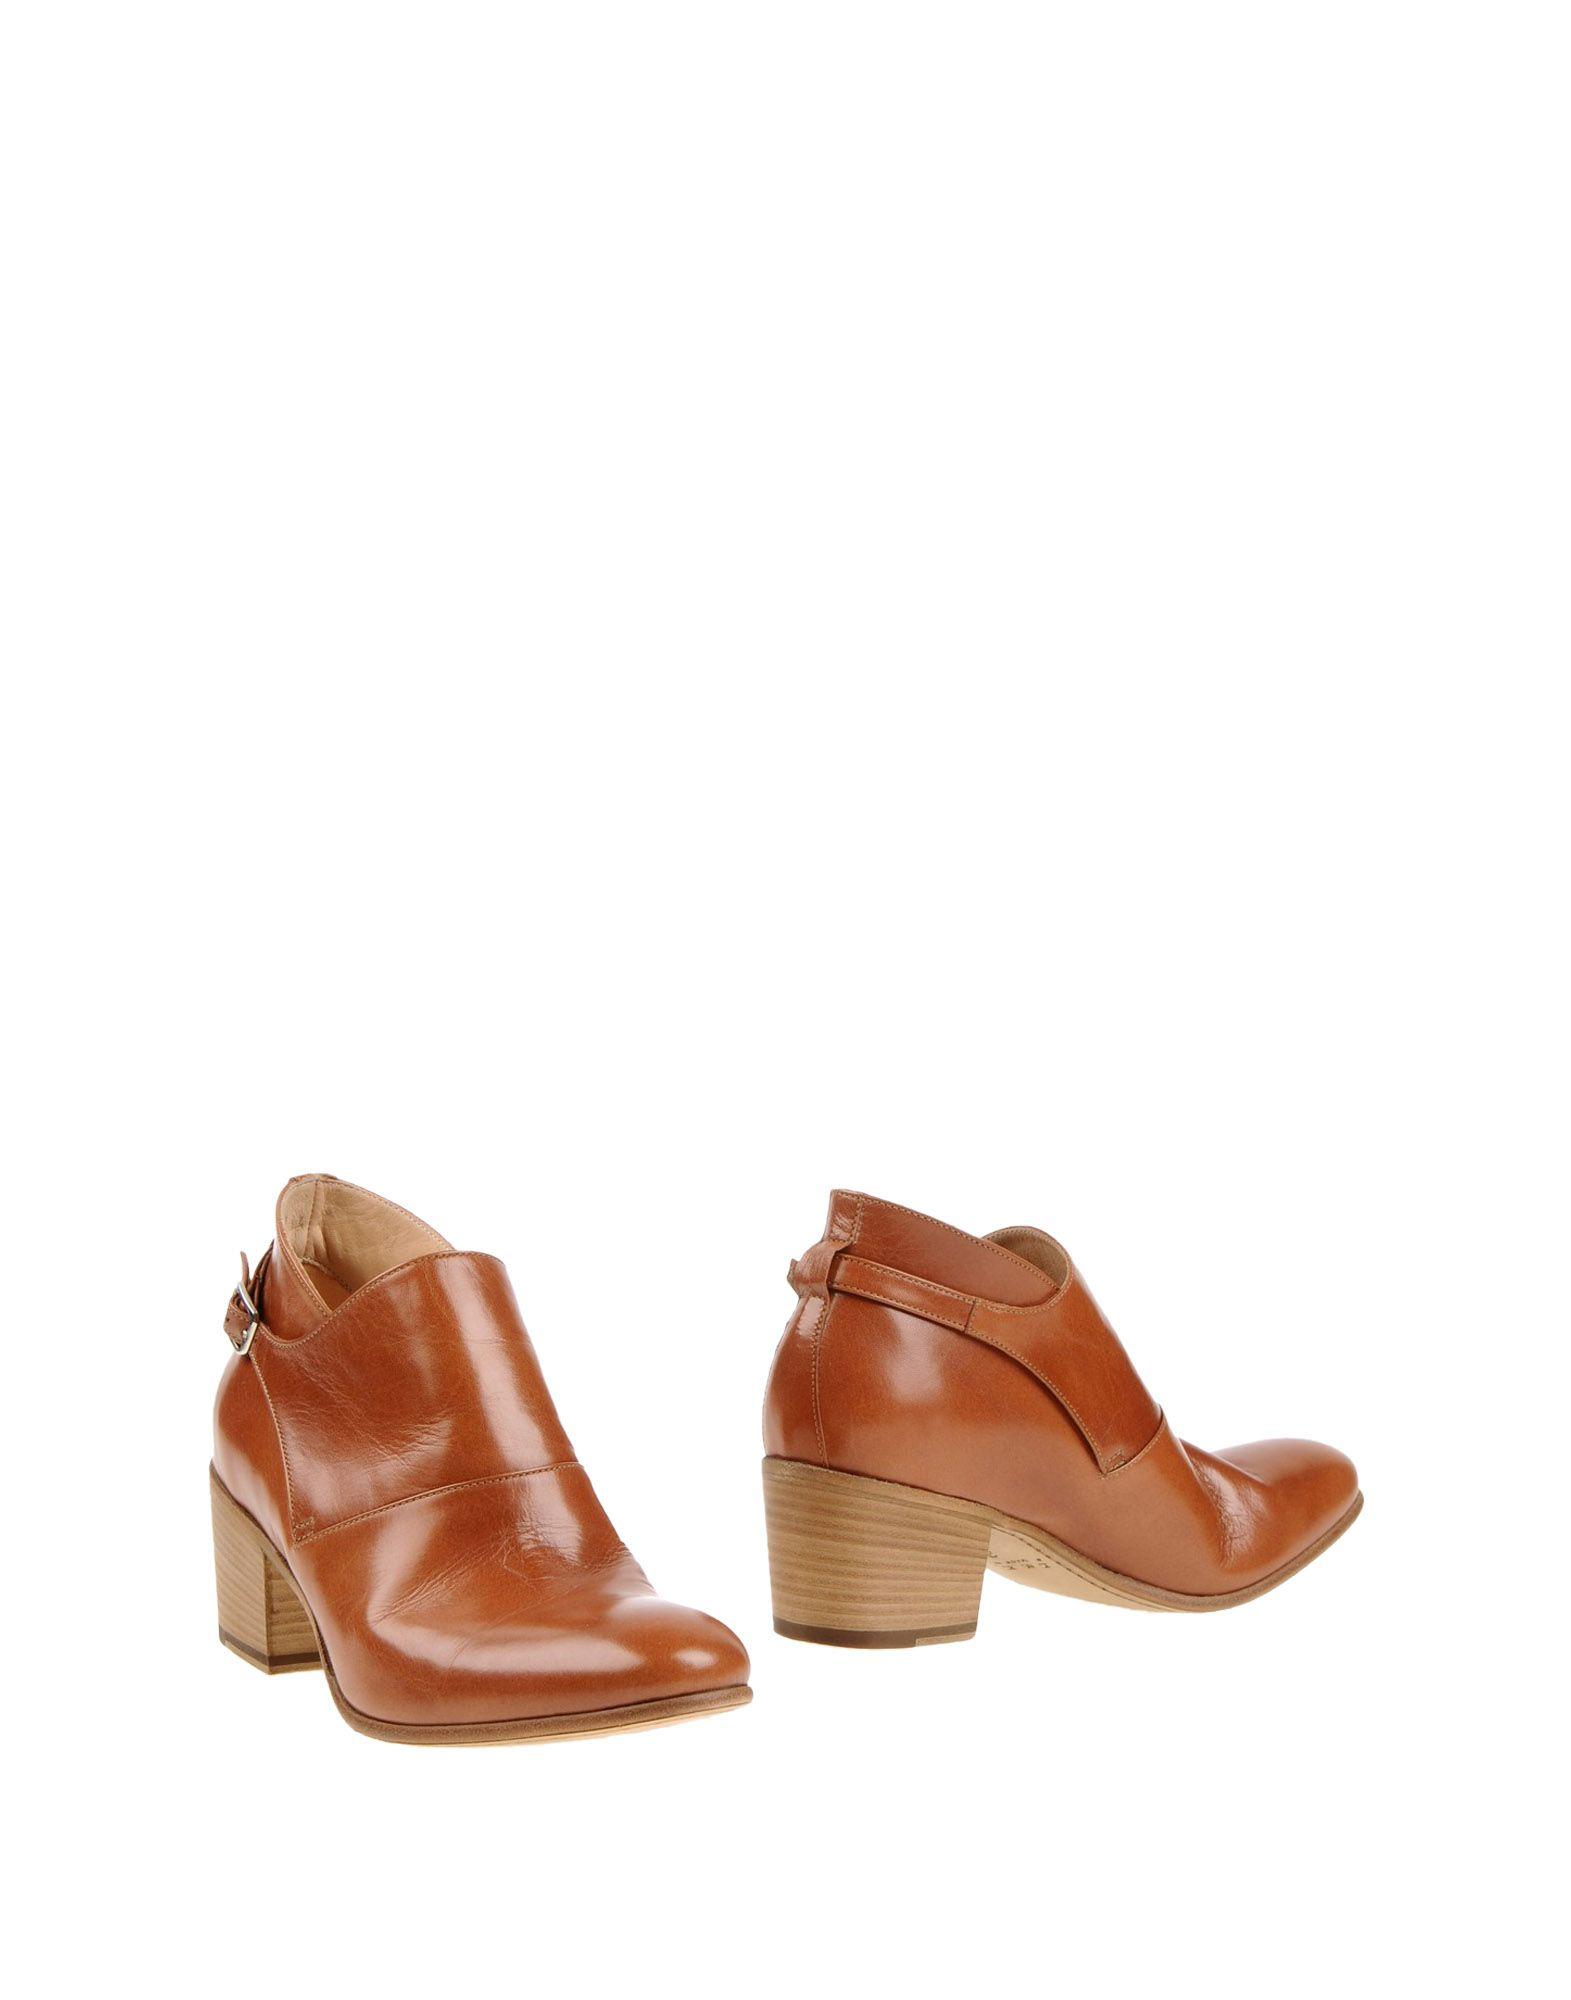 I.N.K. Shoes Stiefelette Damen  11398245LA Gute Qualität beliebte Schuhe